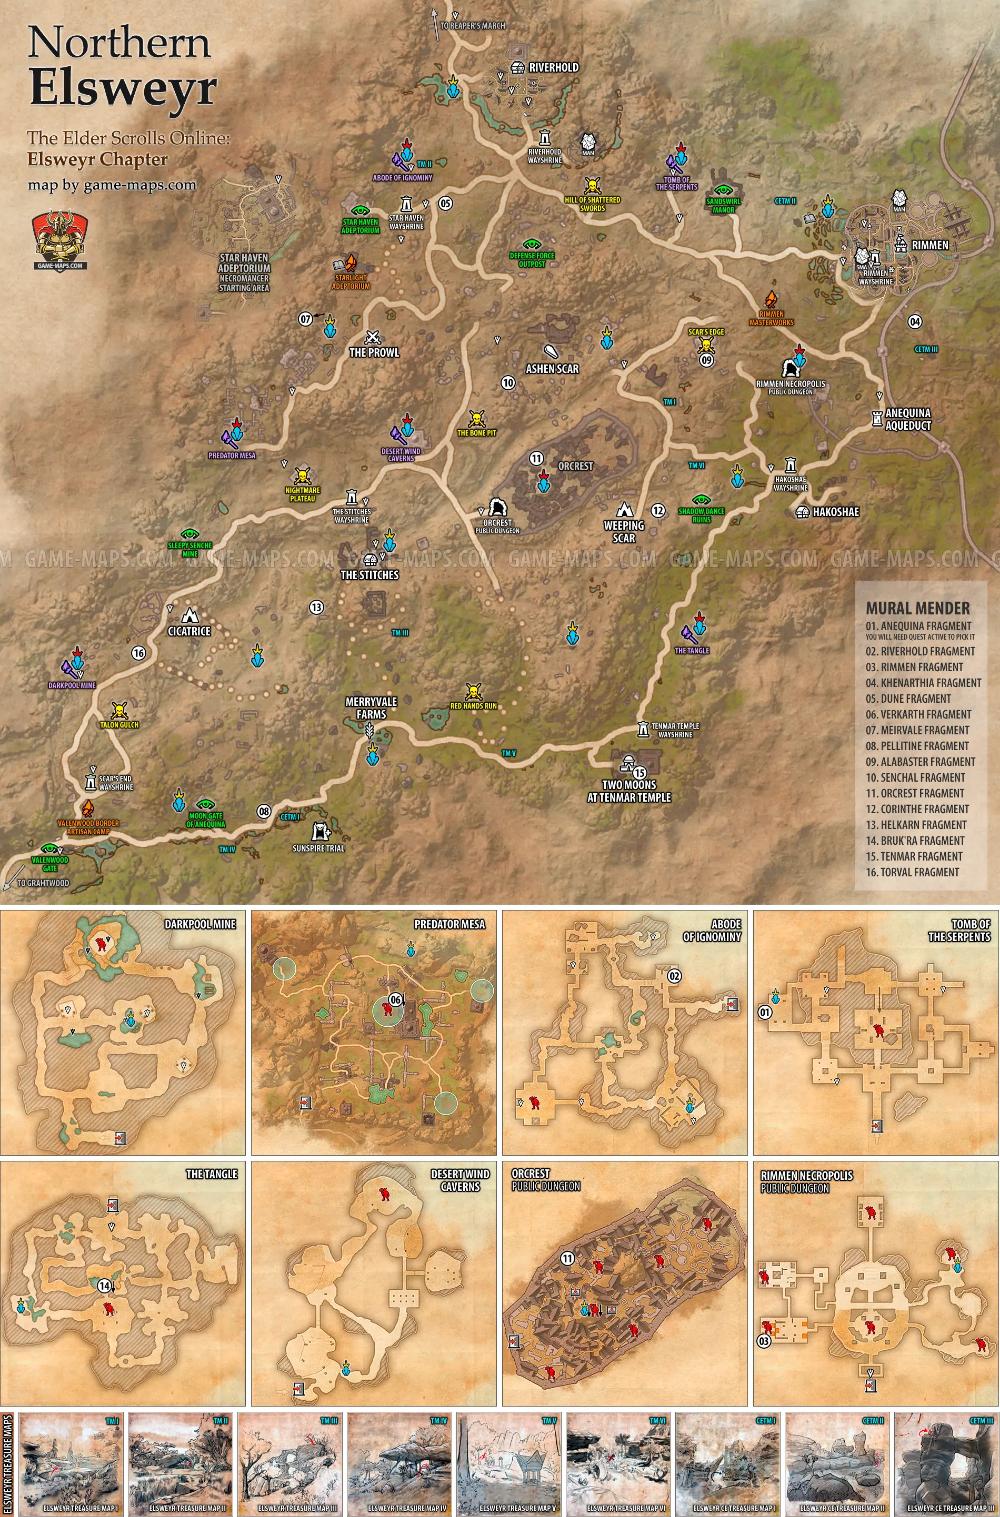 Khenarthi's Roost Ce Treasure Map : khenarthi's, roost, treasure, Northern, Elsweyr, Elder, Scrolls, Online,